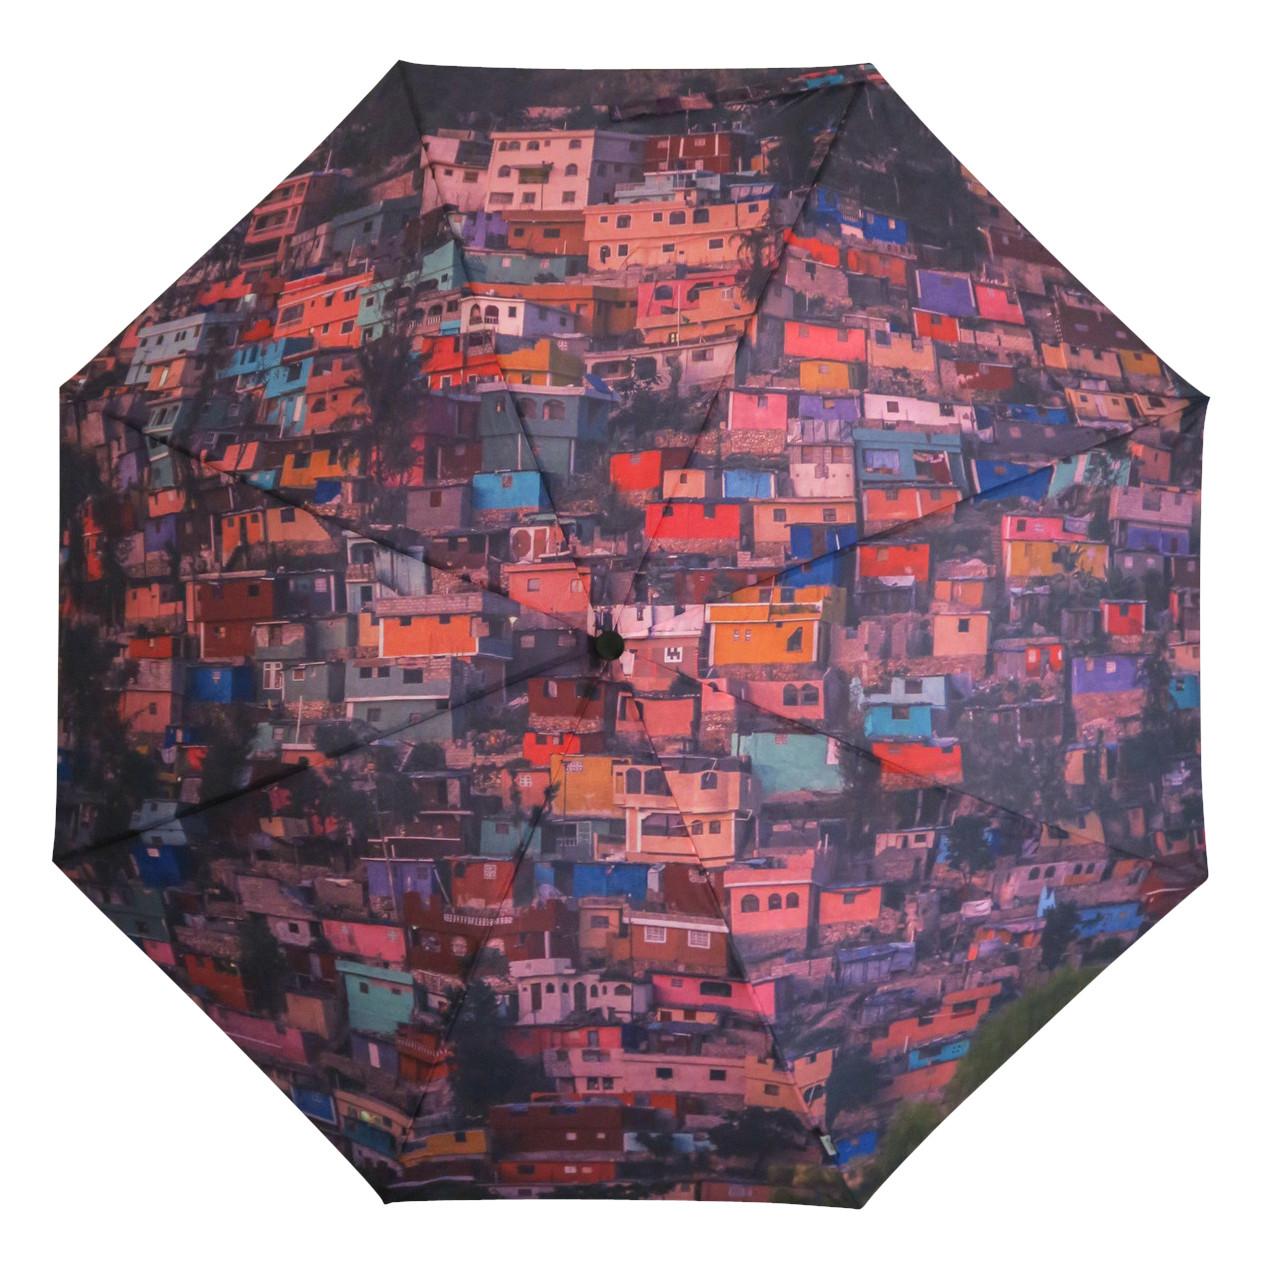 pluvio_umbrella_10